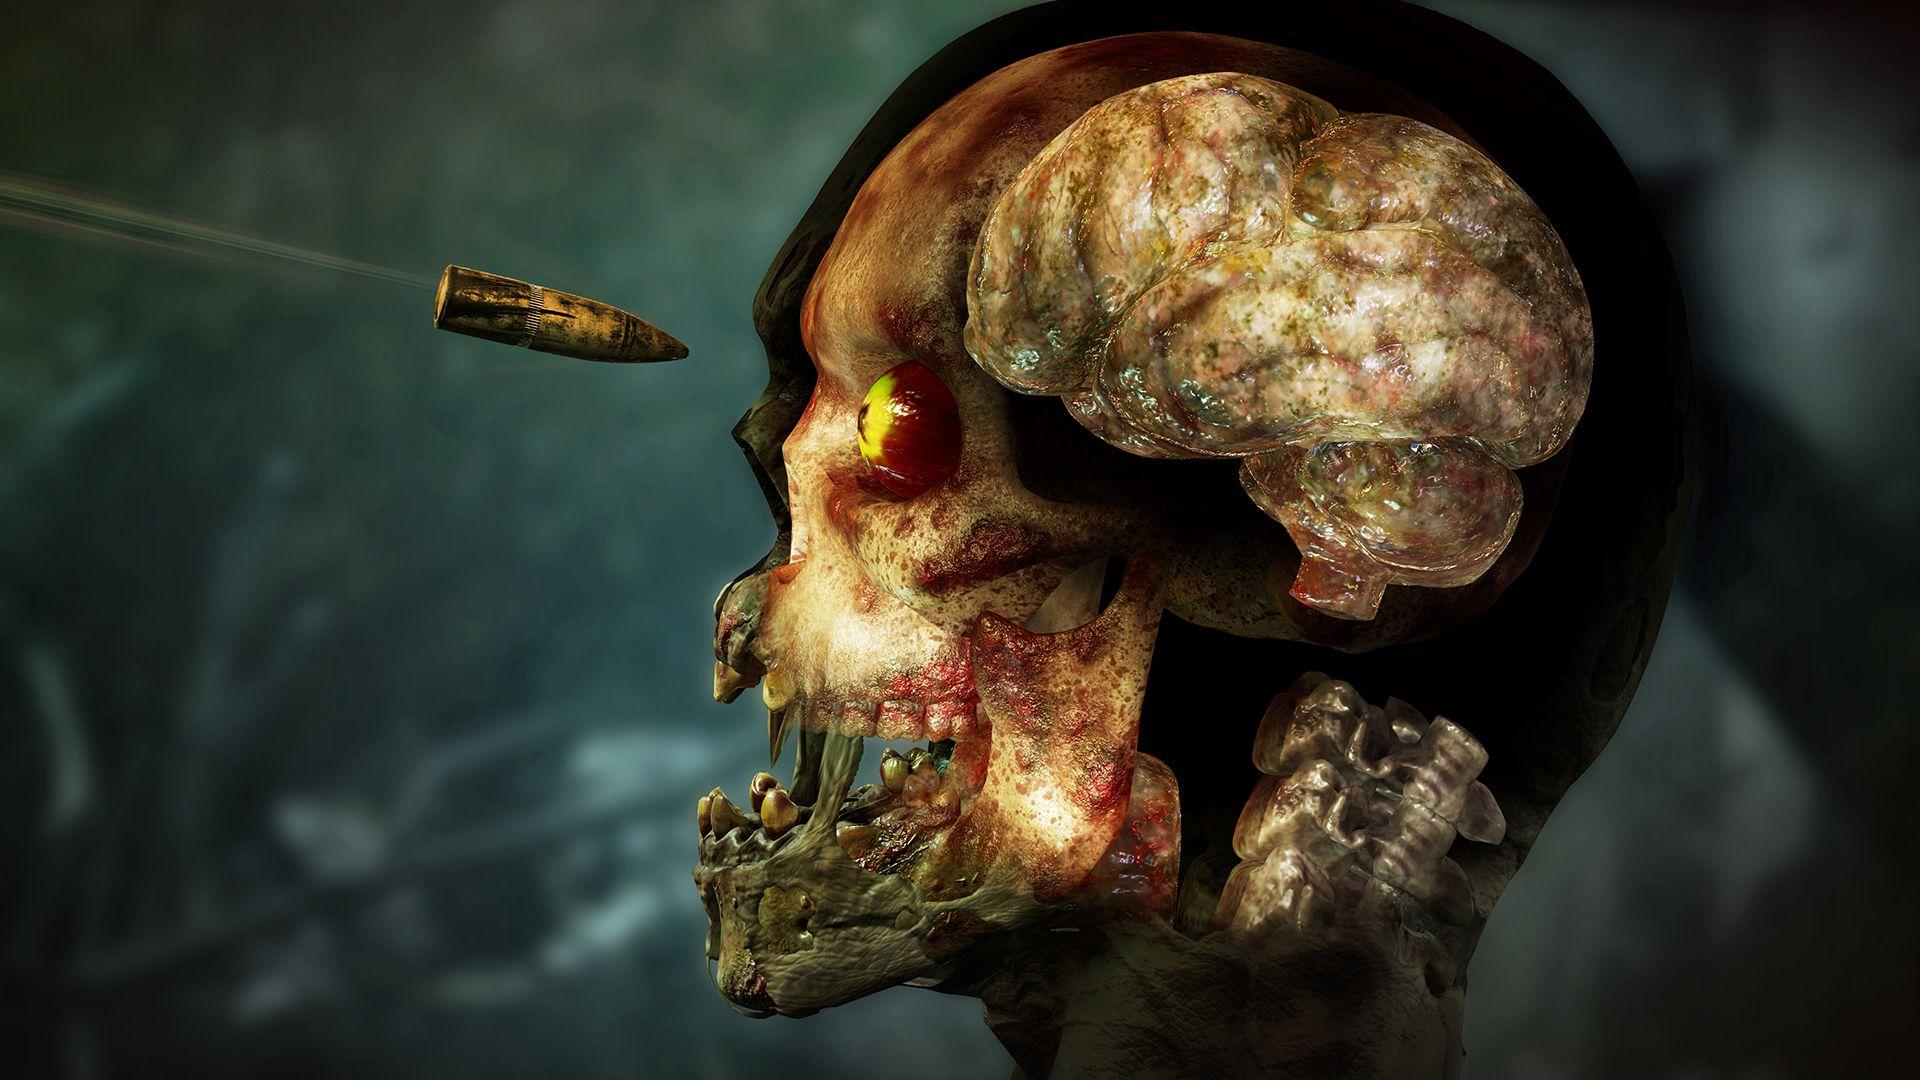 Zombie kill cam